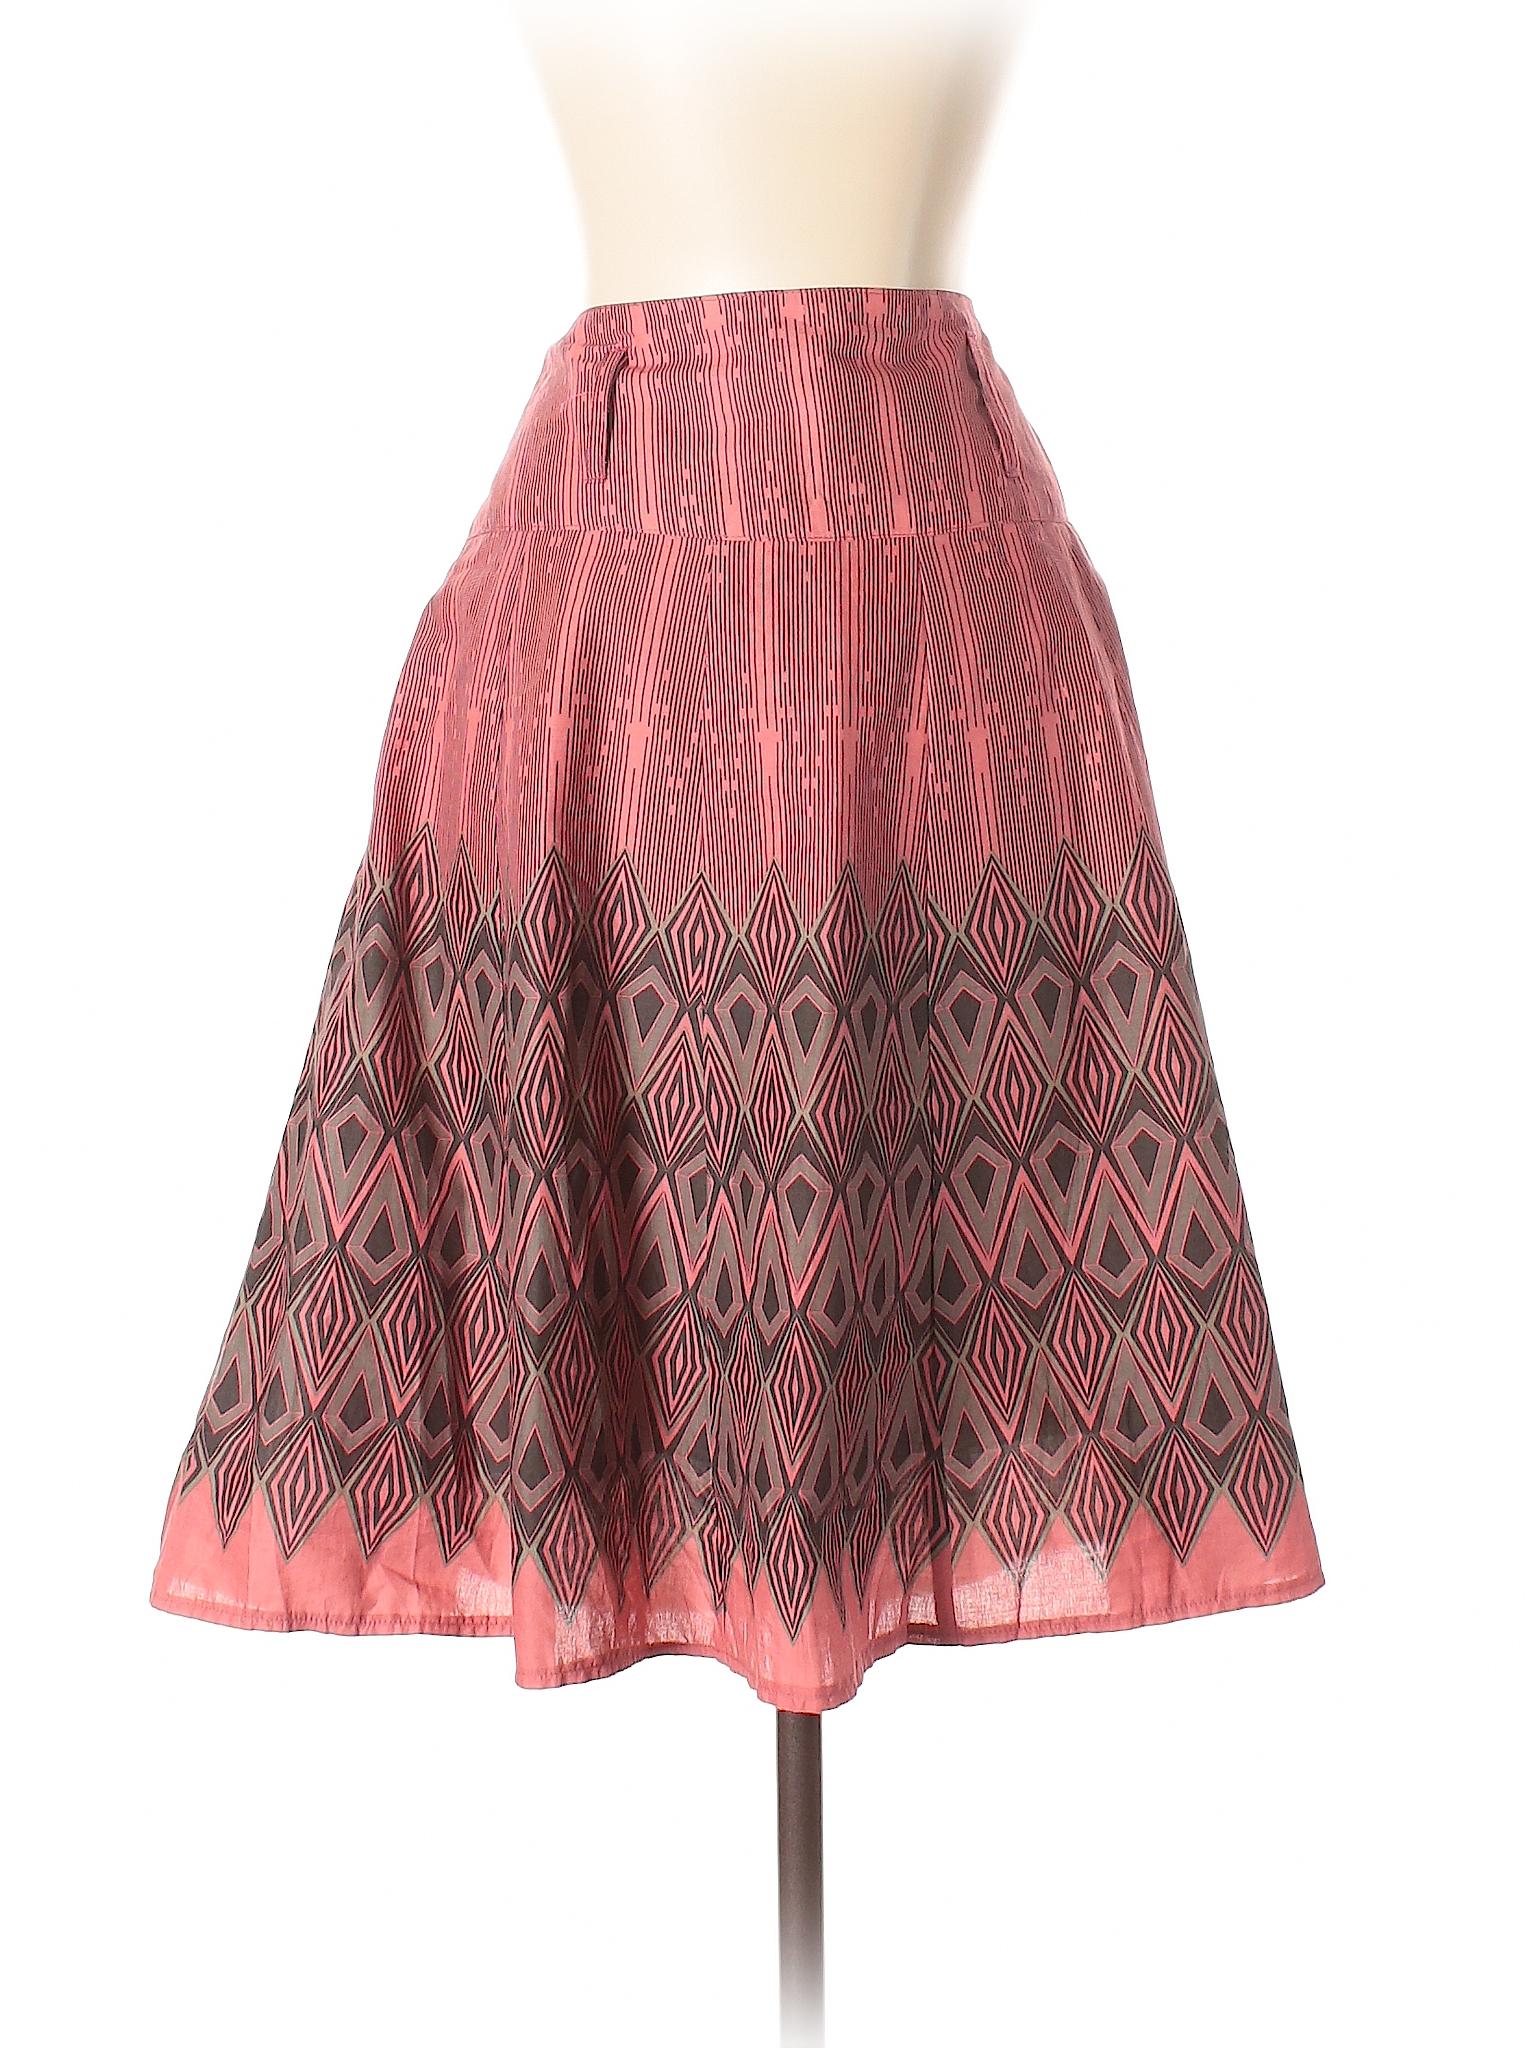 Boutique Aryeh Aryeh Casual Boutique Aryeh Skirt Aryeh Boutique Casual Skirt Skirt Boutique Casual 4qnwAqSar